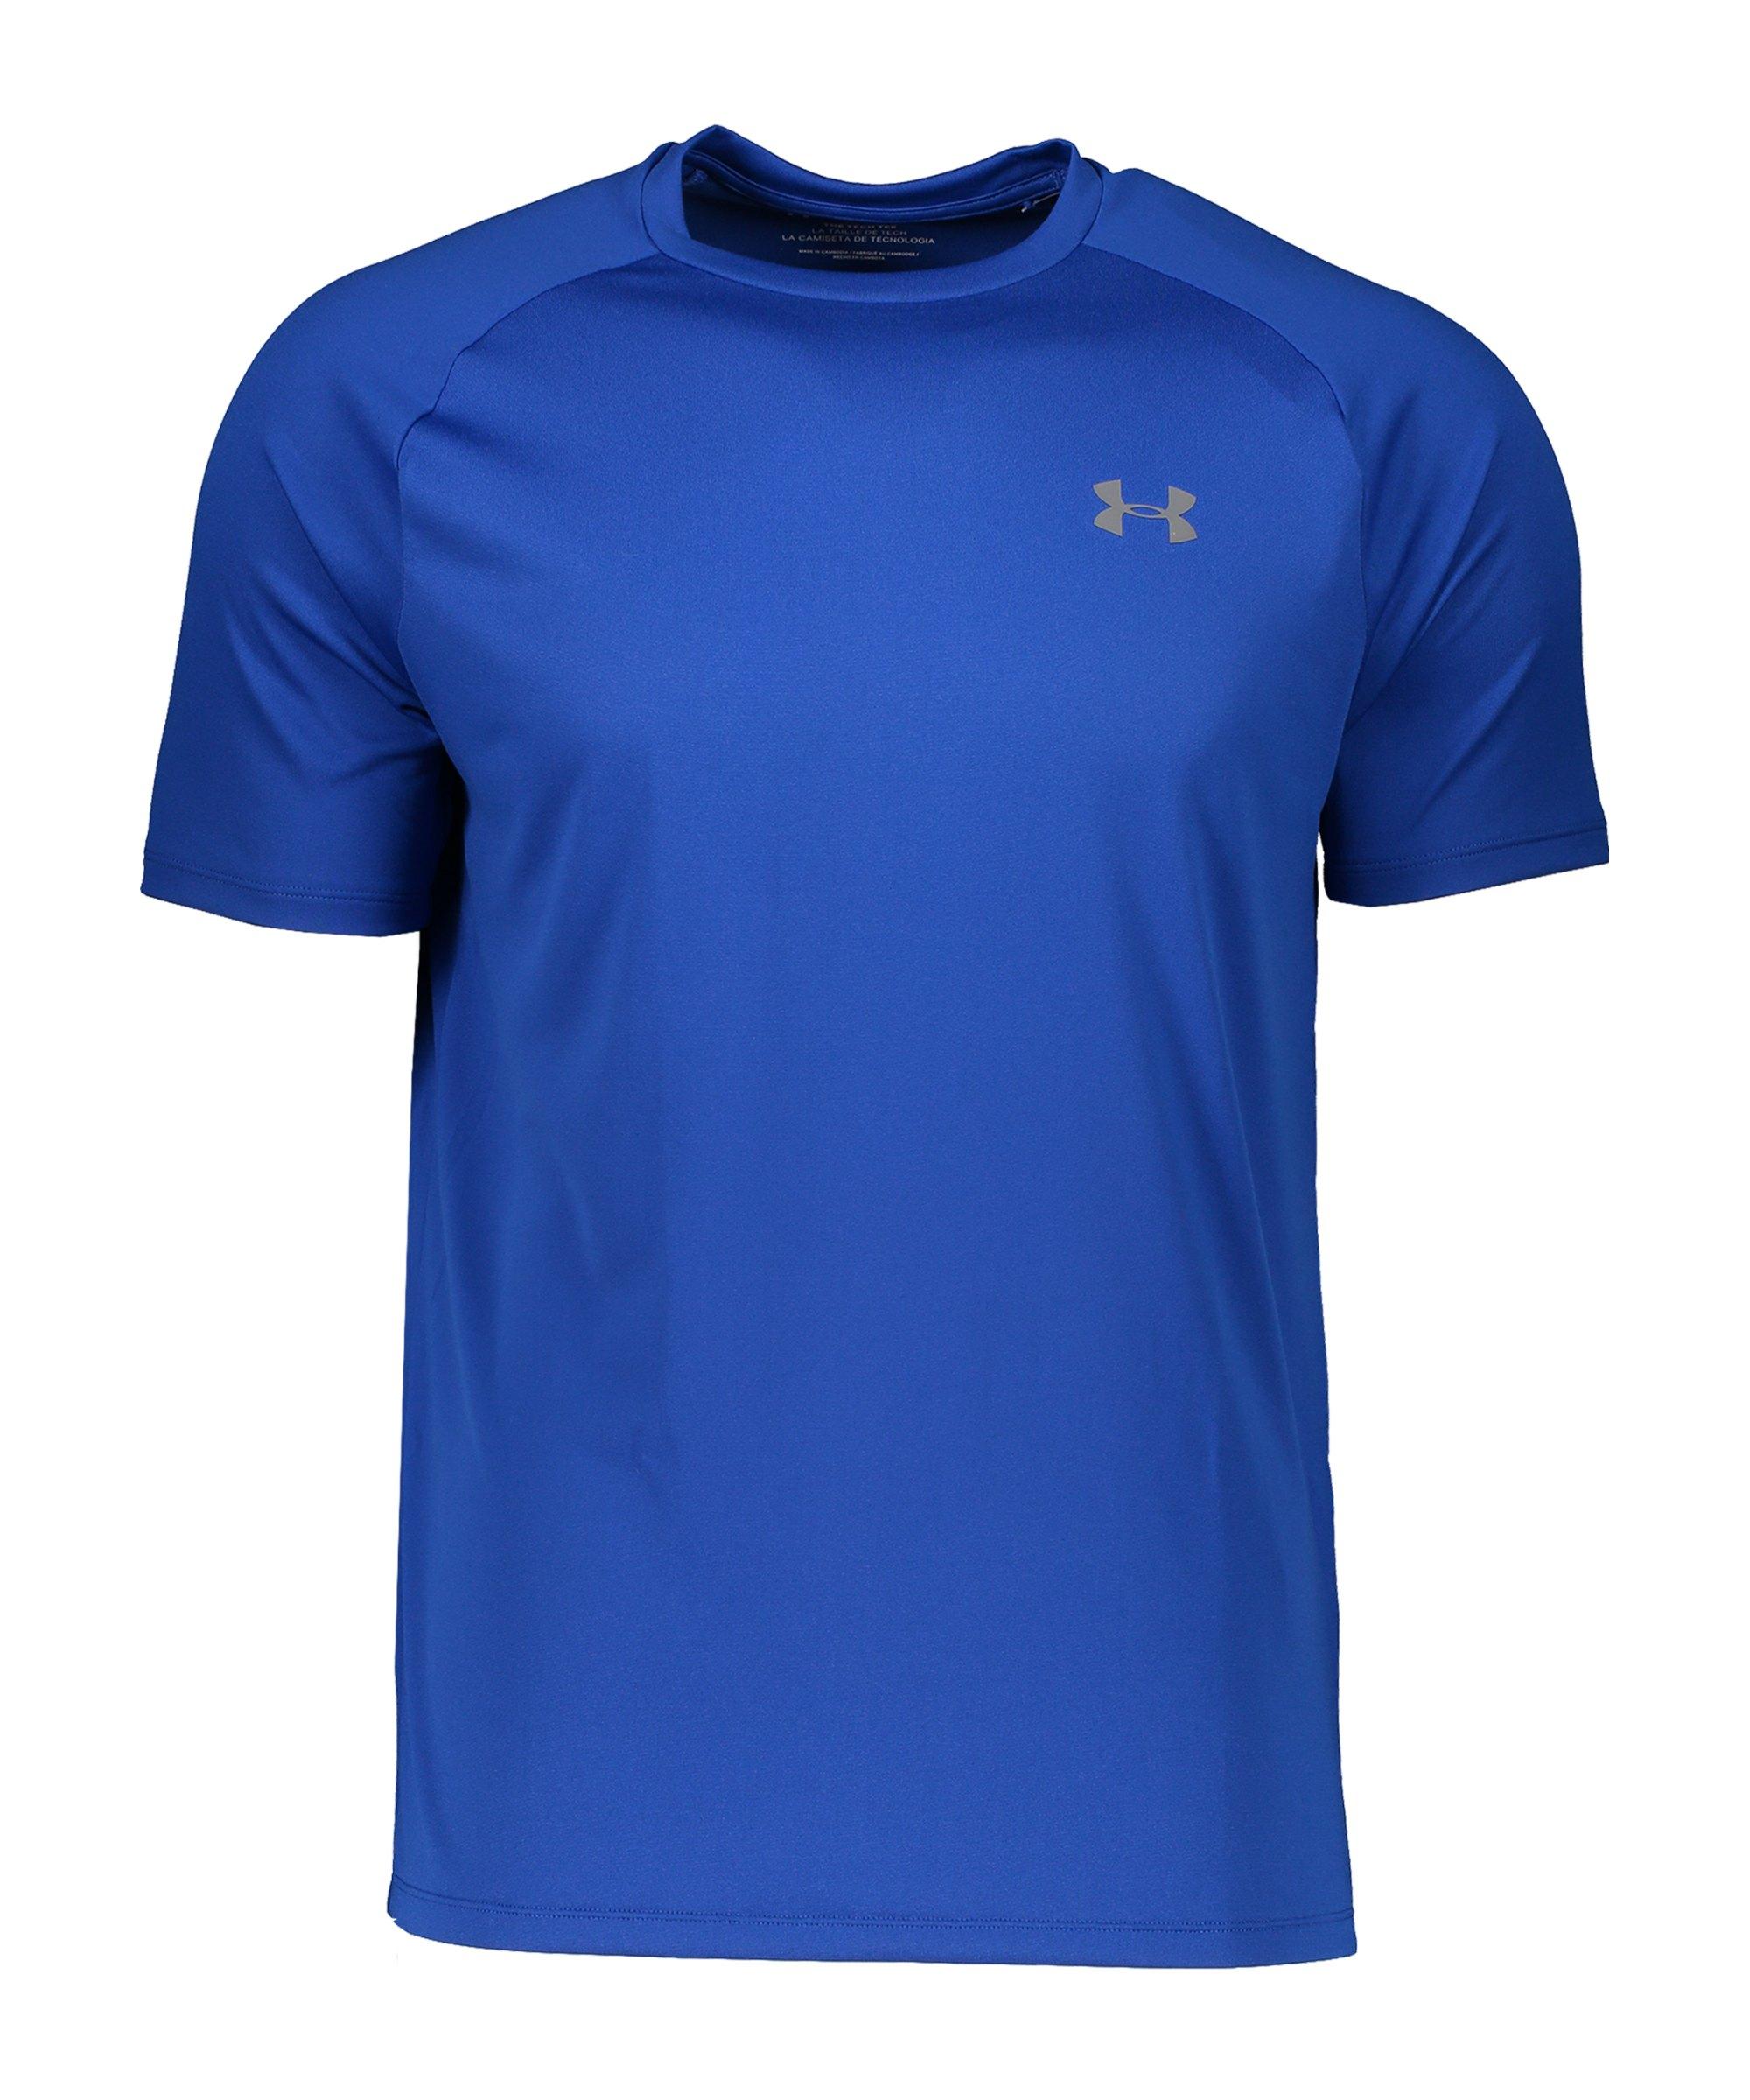 Under Armour Tech T-Shirt Blau F400 - blau